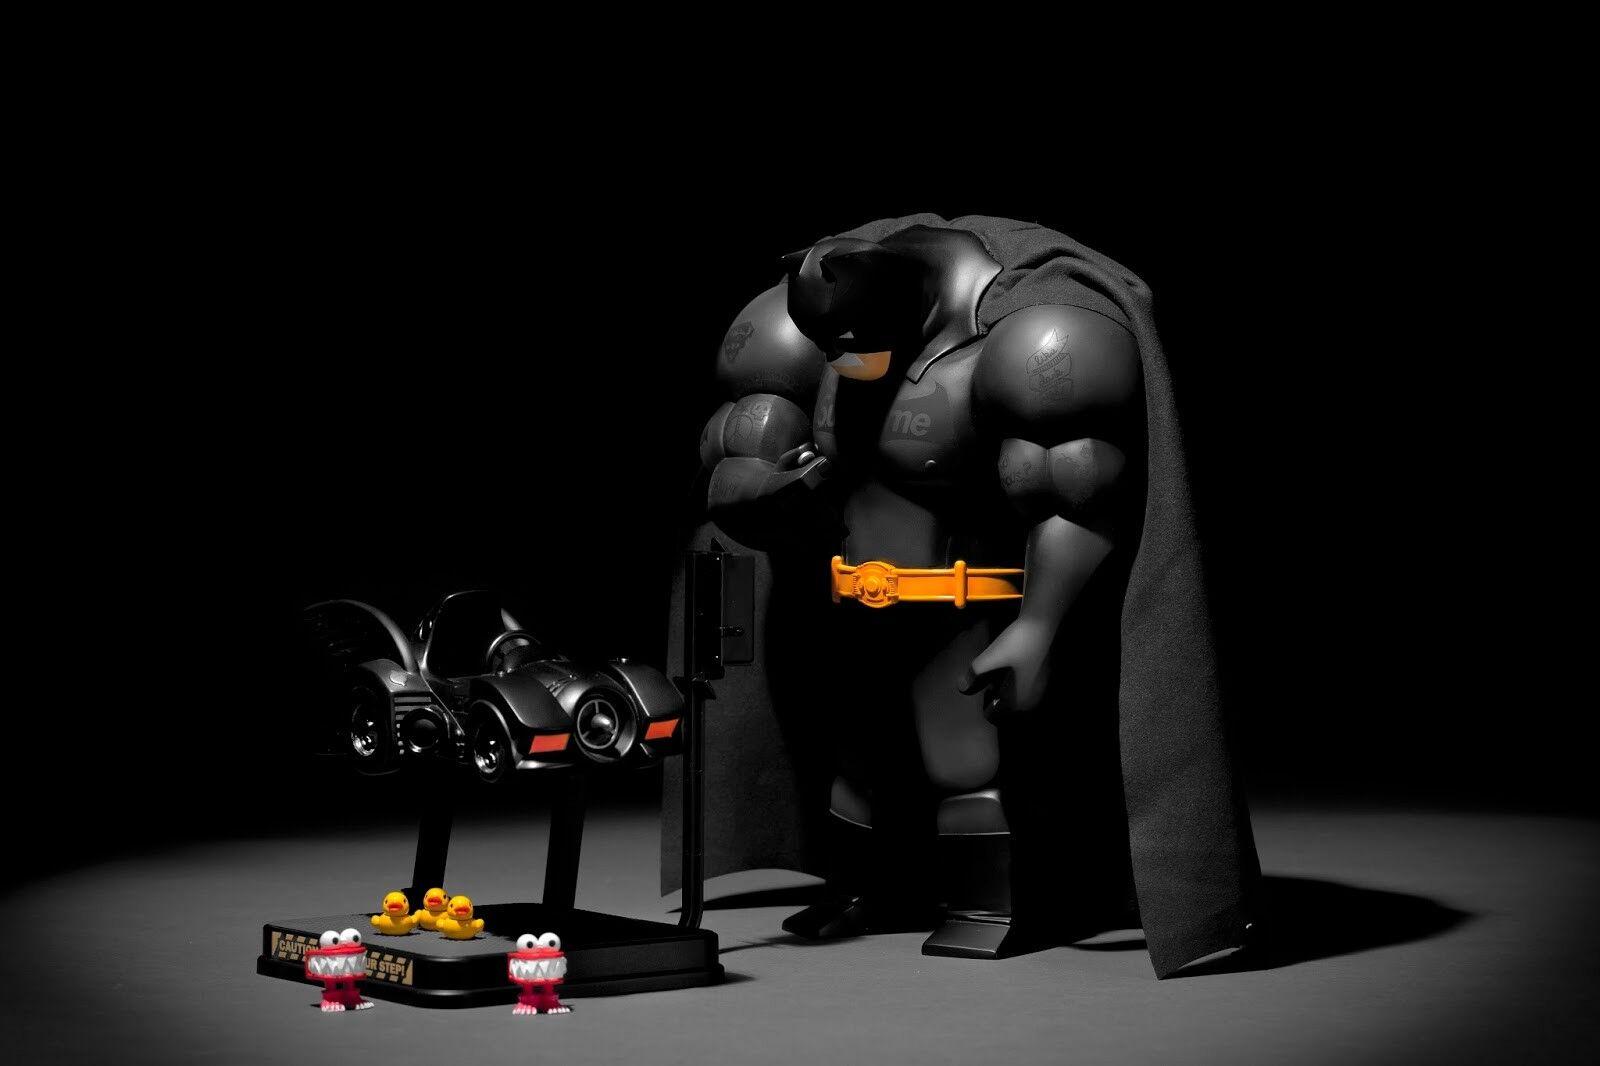 Fools Paradise The Dark Rise 89 läderlappen DC serier Colleble figure 1pc